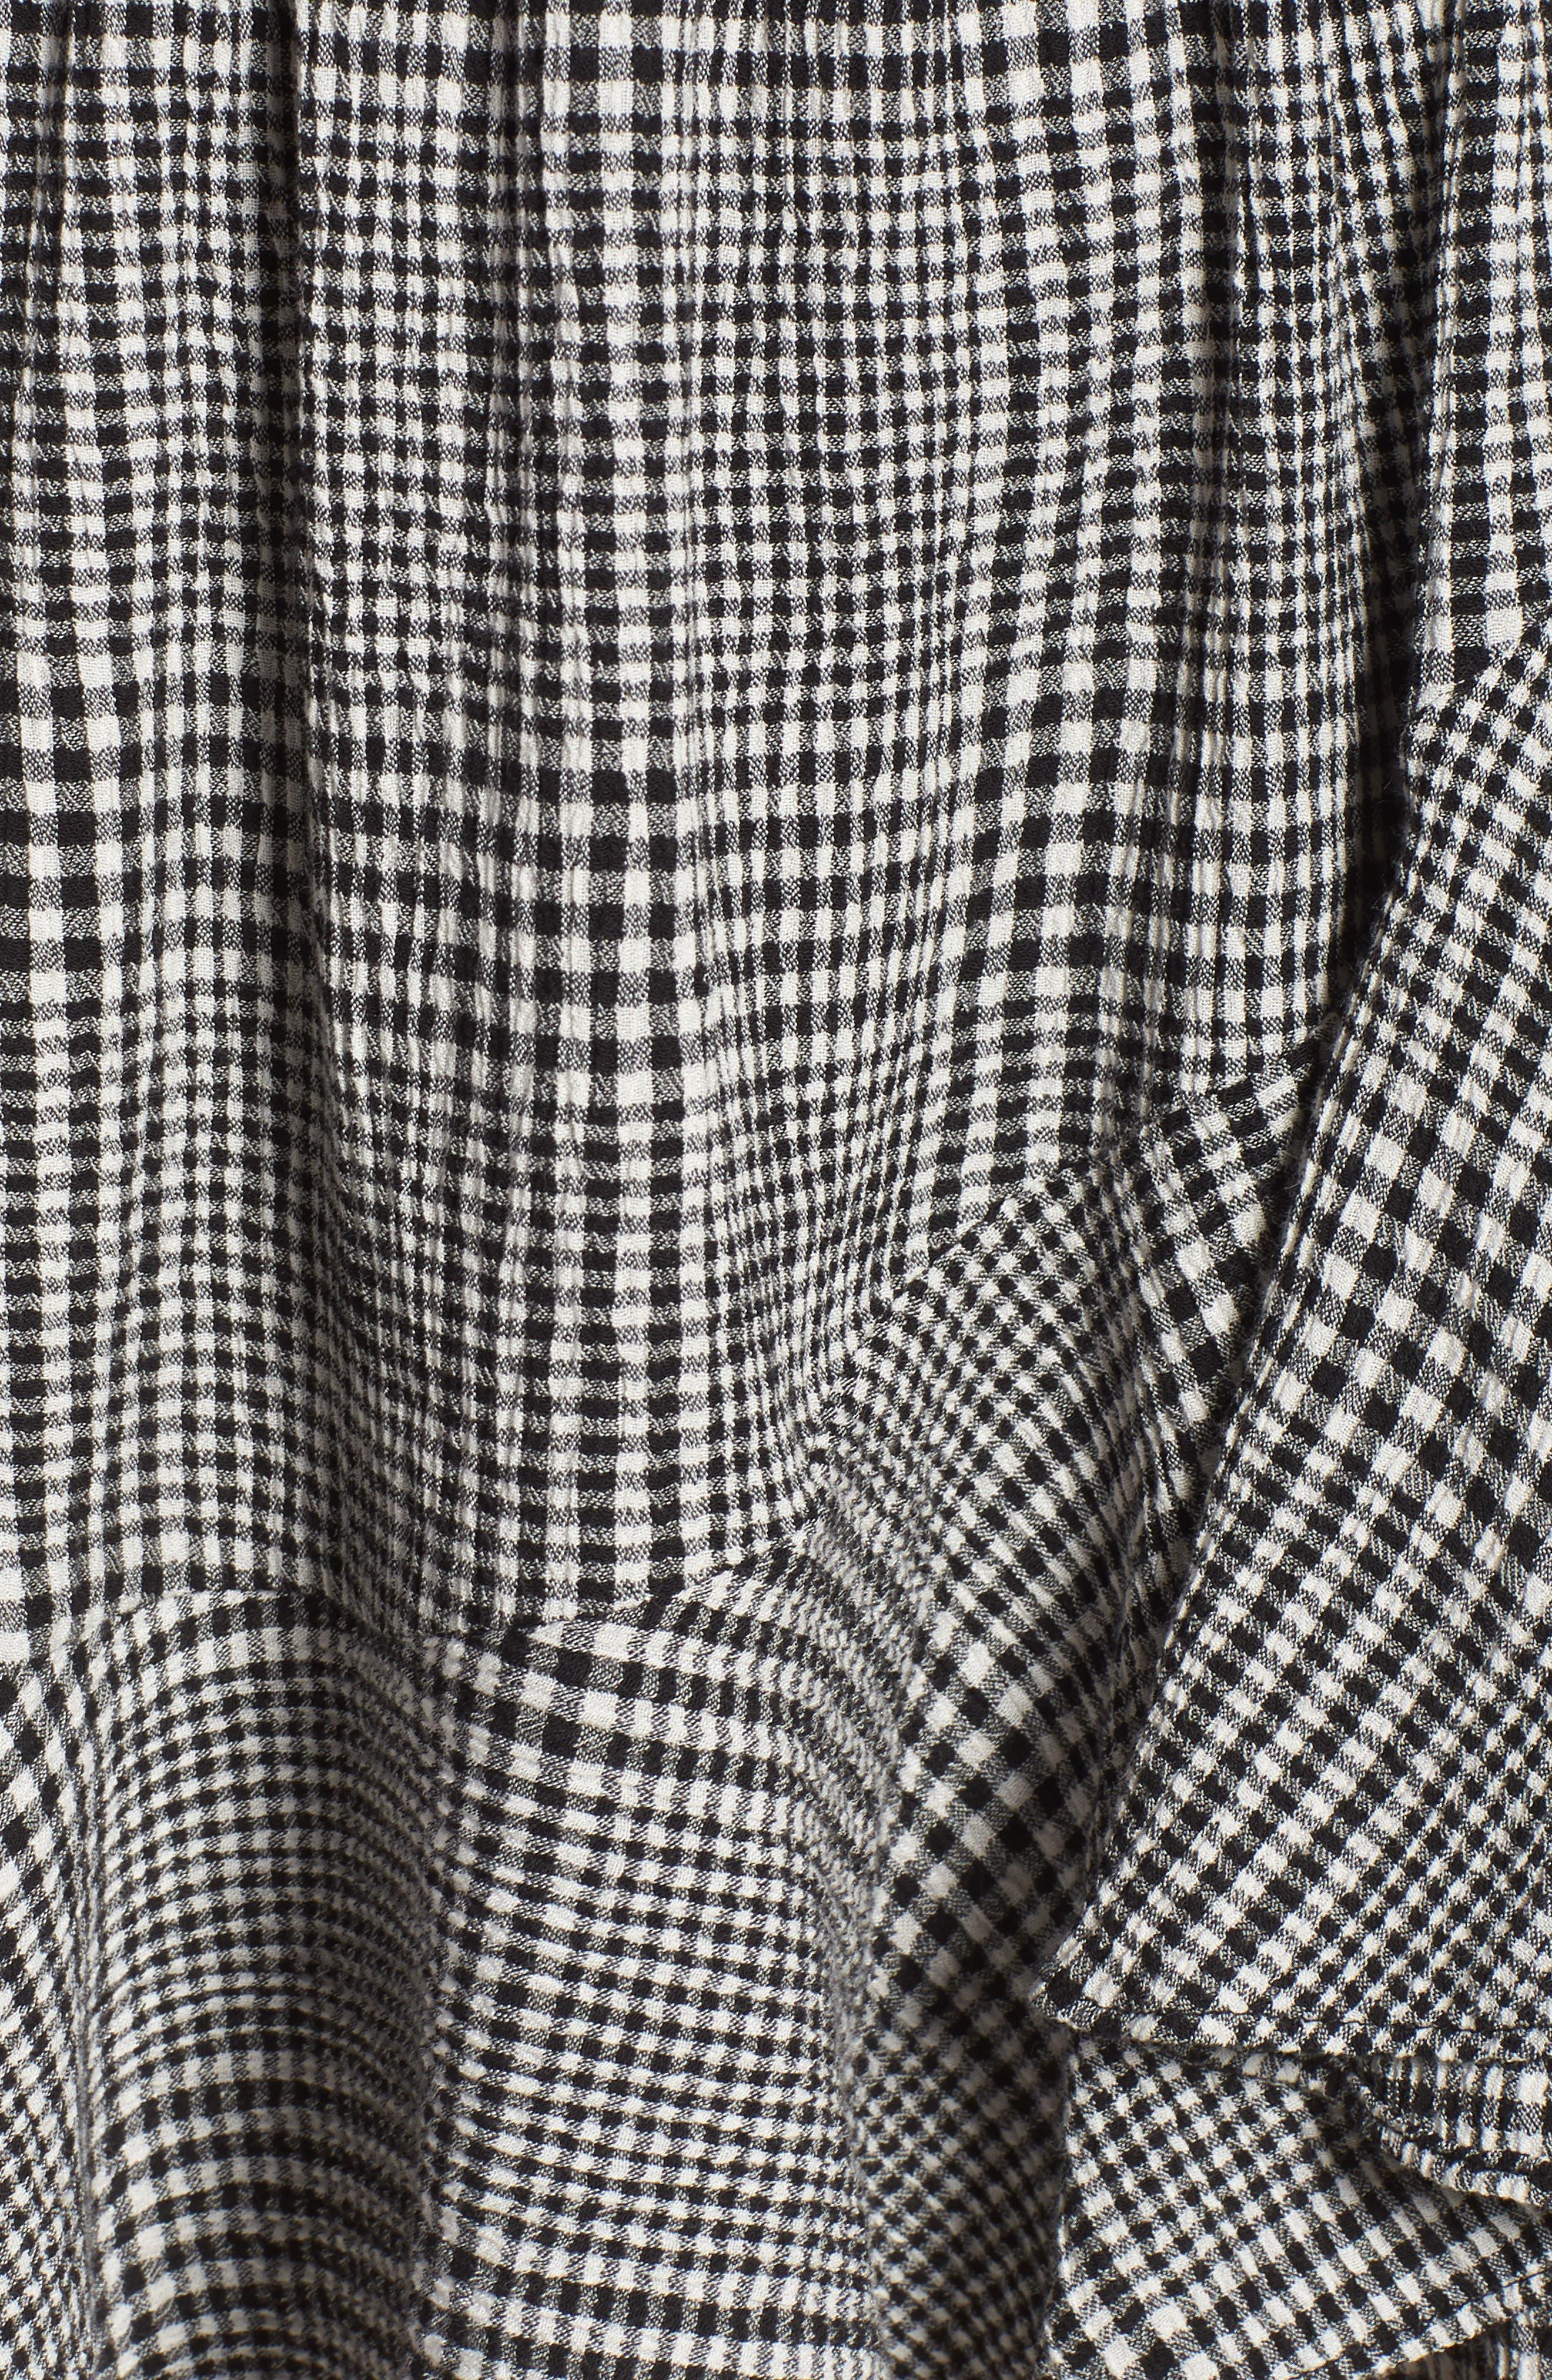 Glen Plaid Wrap Style Romper,                             Alternate thumbnail 6, color,                             BLACK MIX GINGHAM